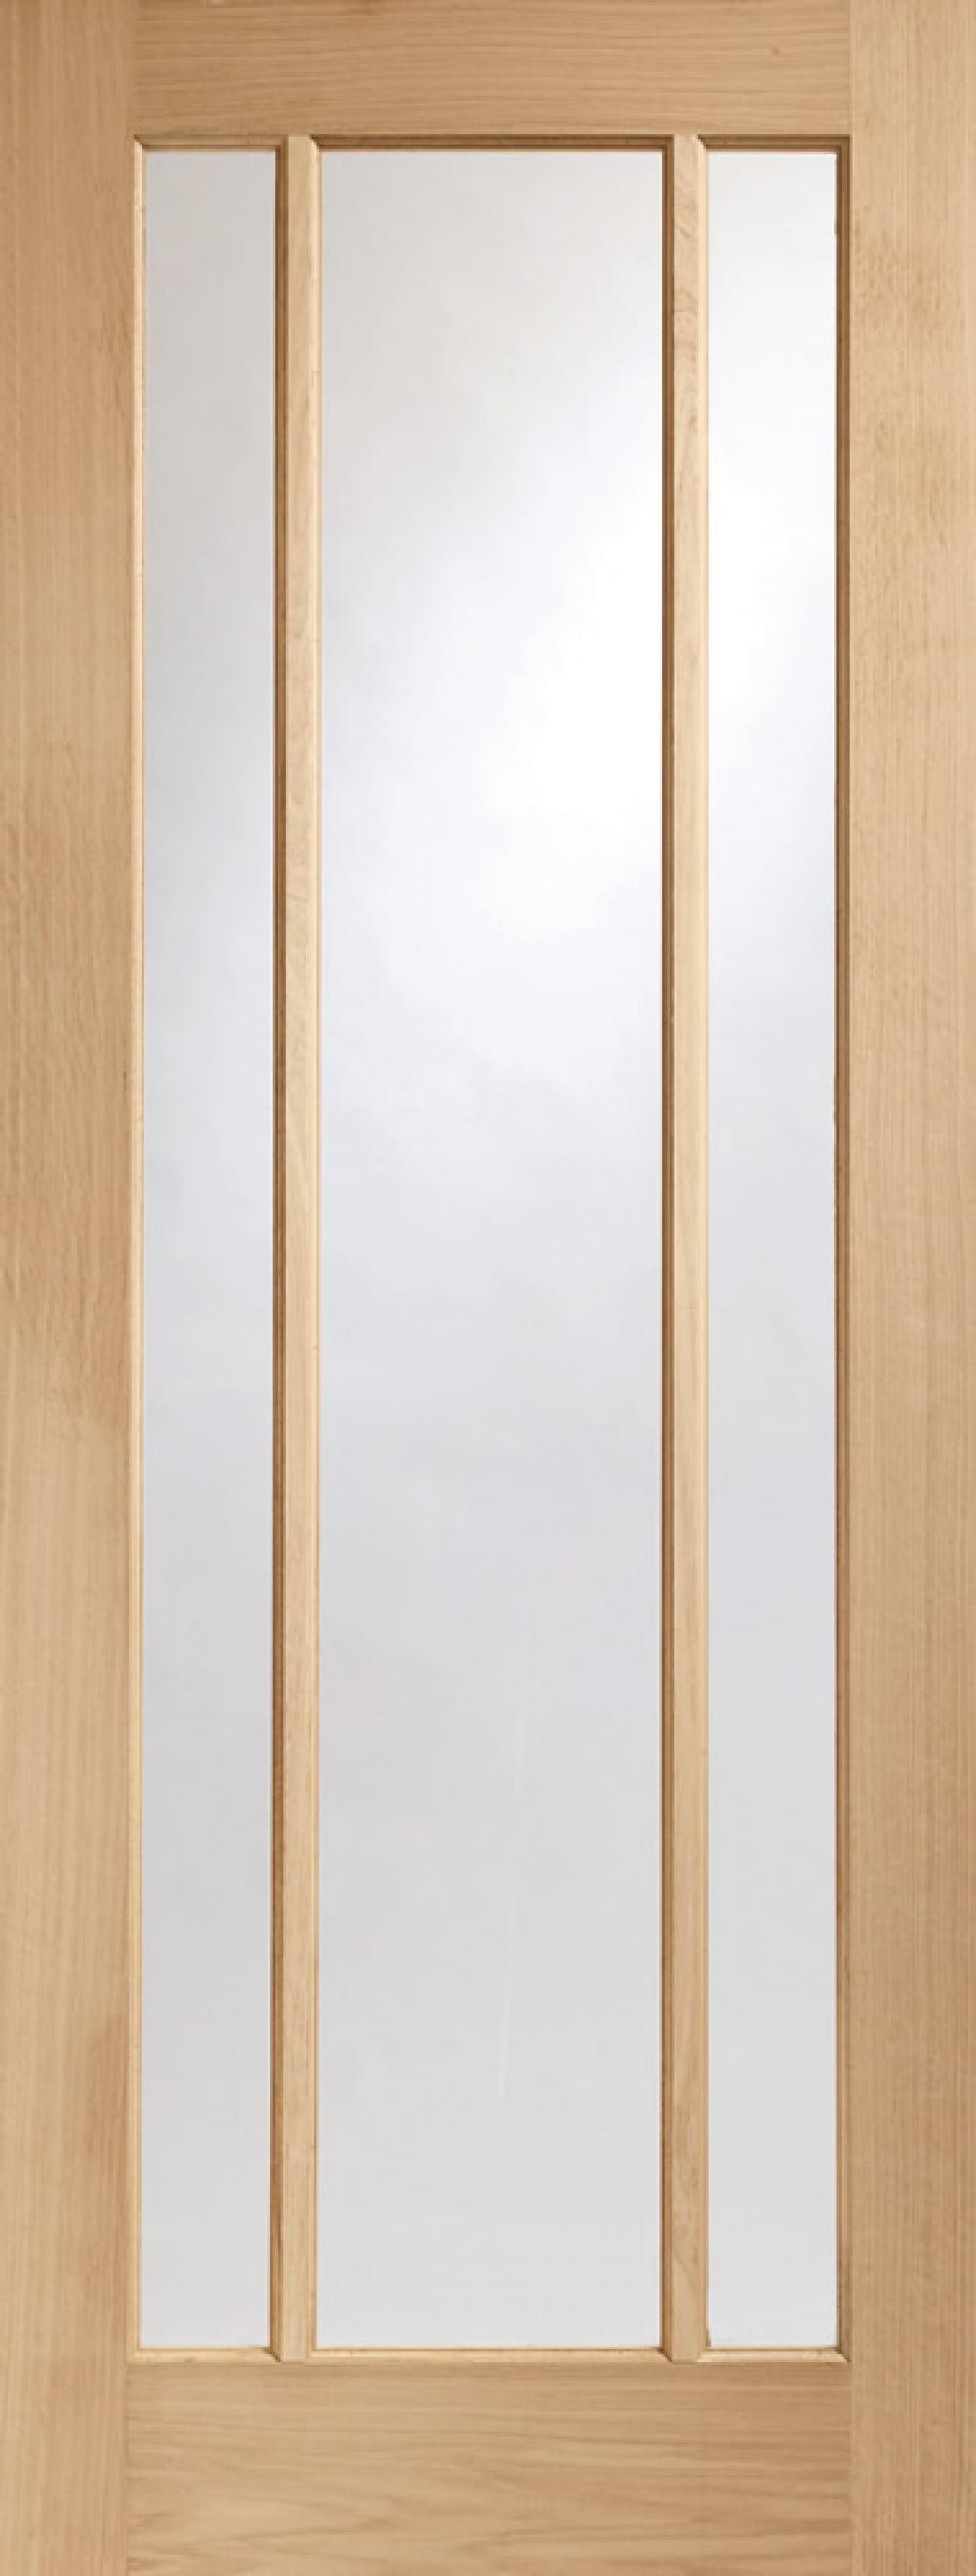 Worcester Oak Glazed Door - PREFINISHED